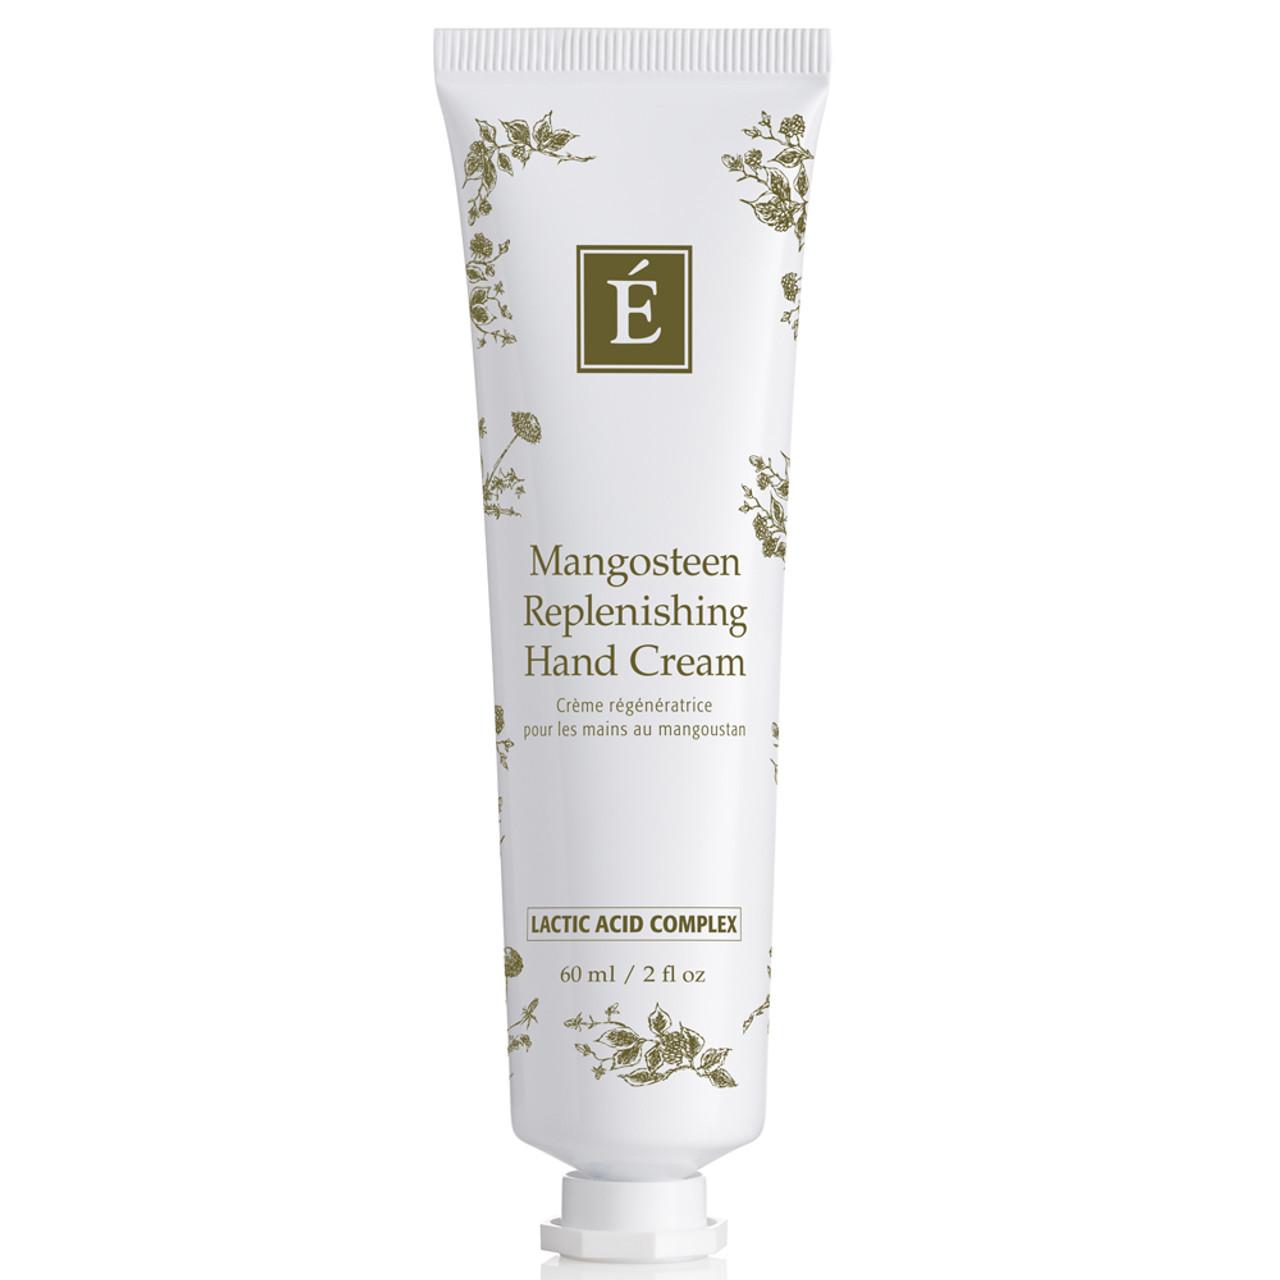 Eminence Mangosteen Replenishing Hand Cream BeautifiedYou.com